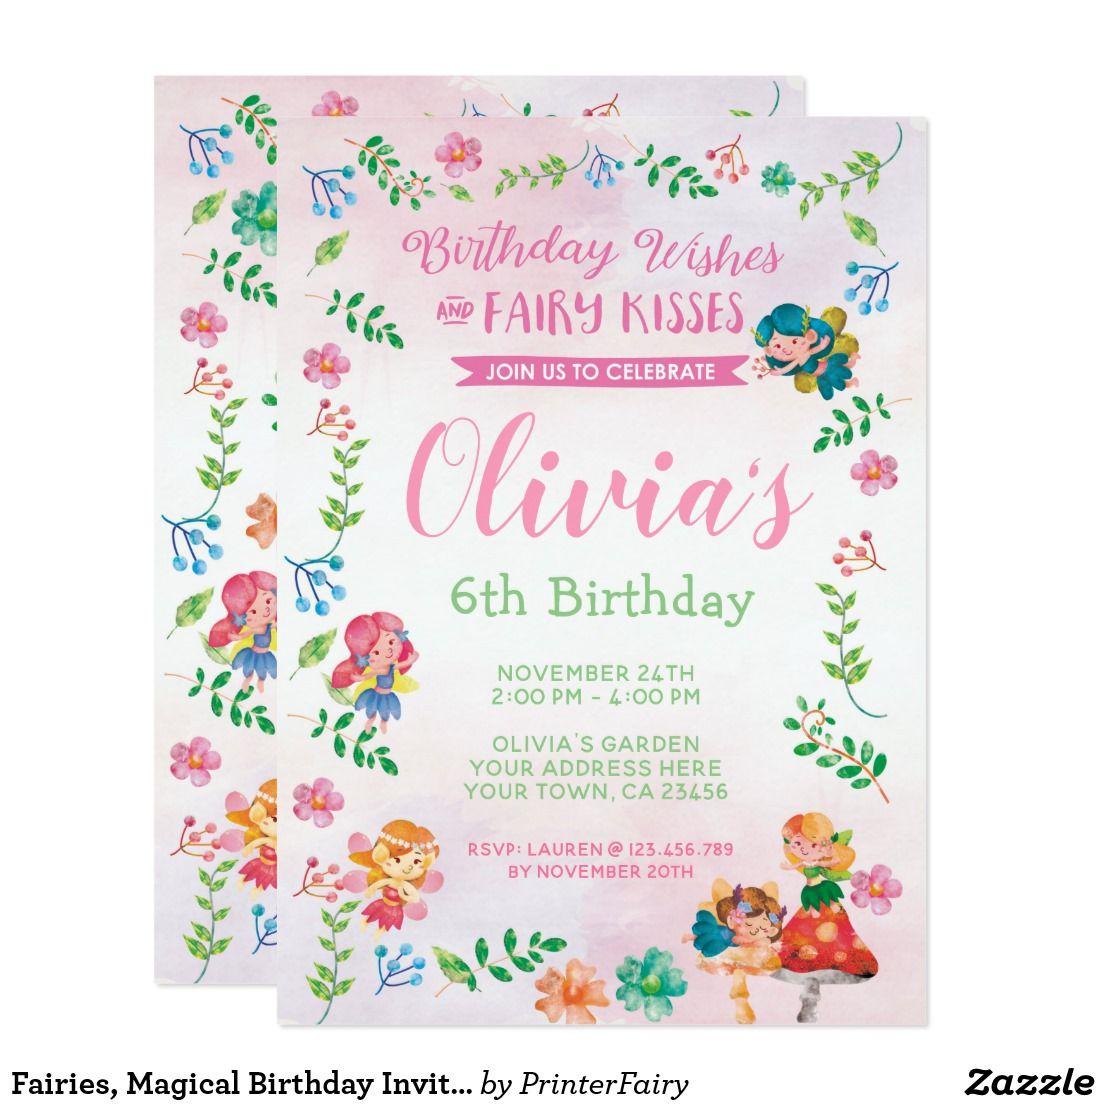 Fairies, Magical Birthday Invitation (With